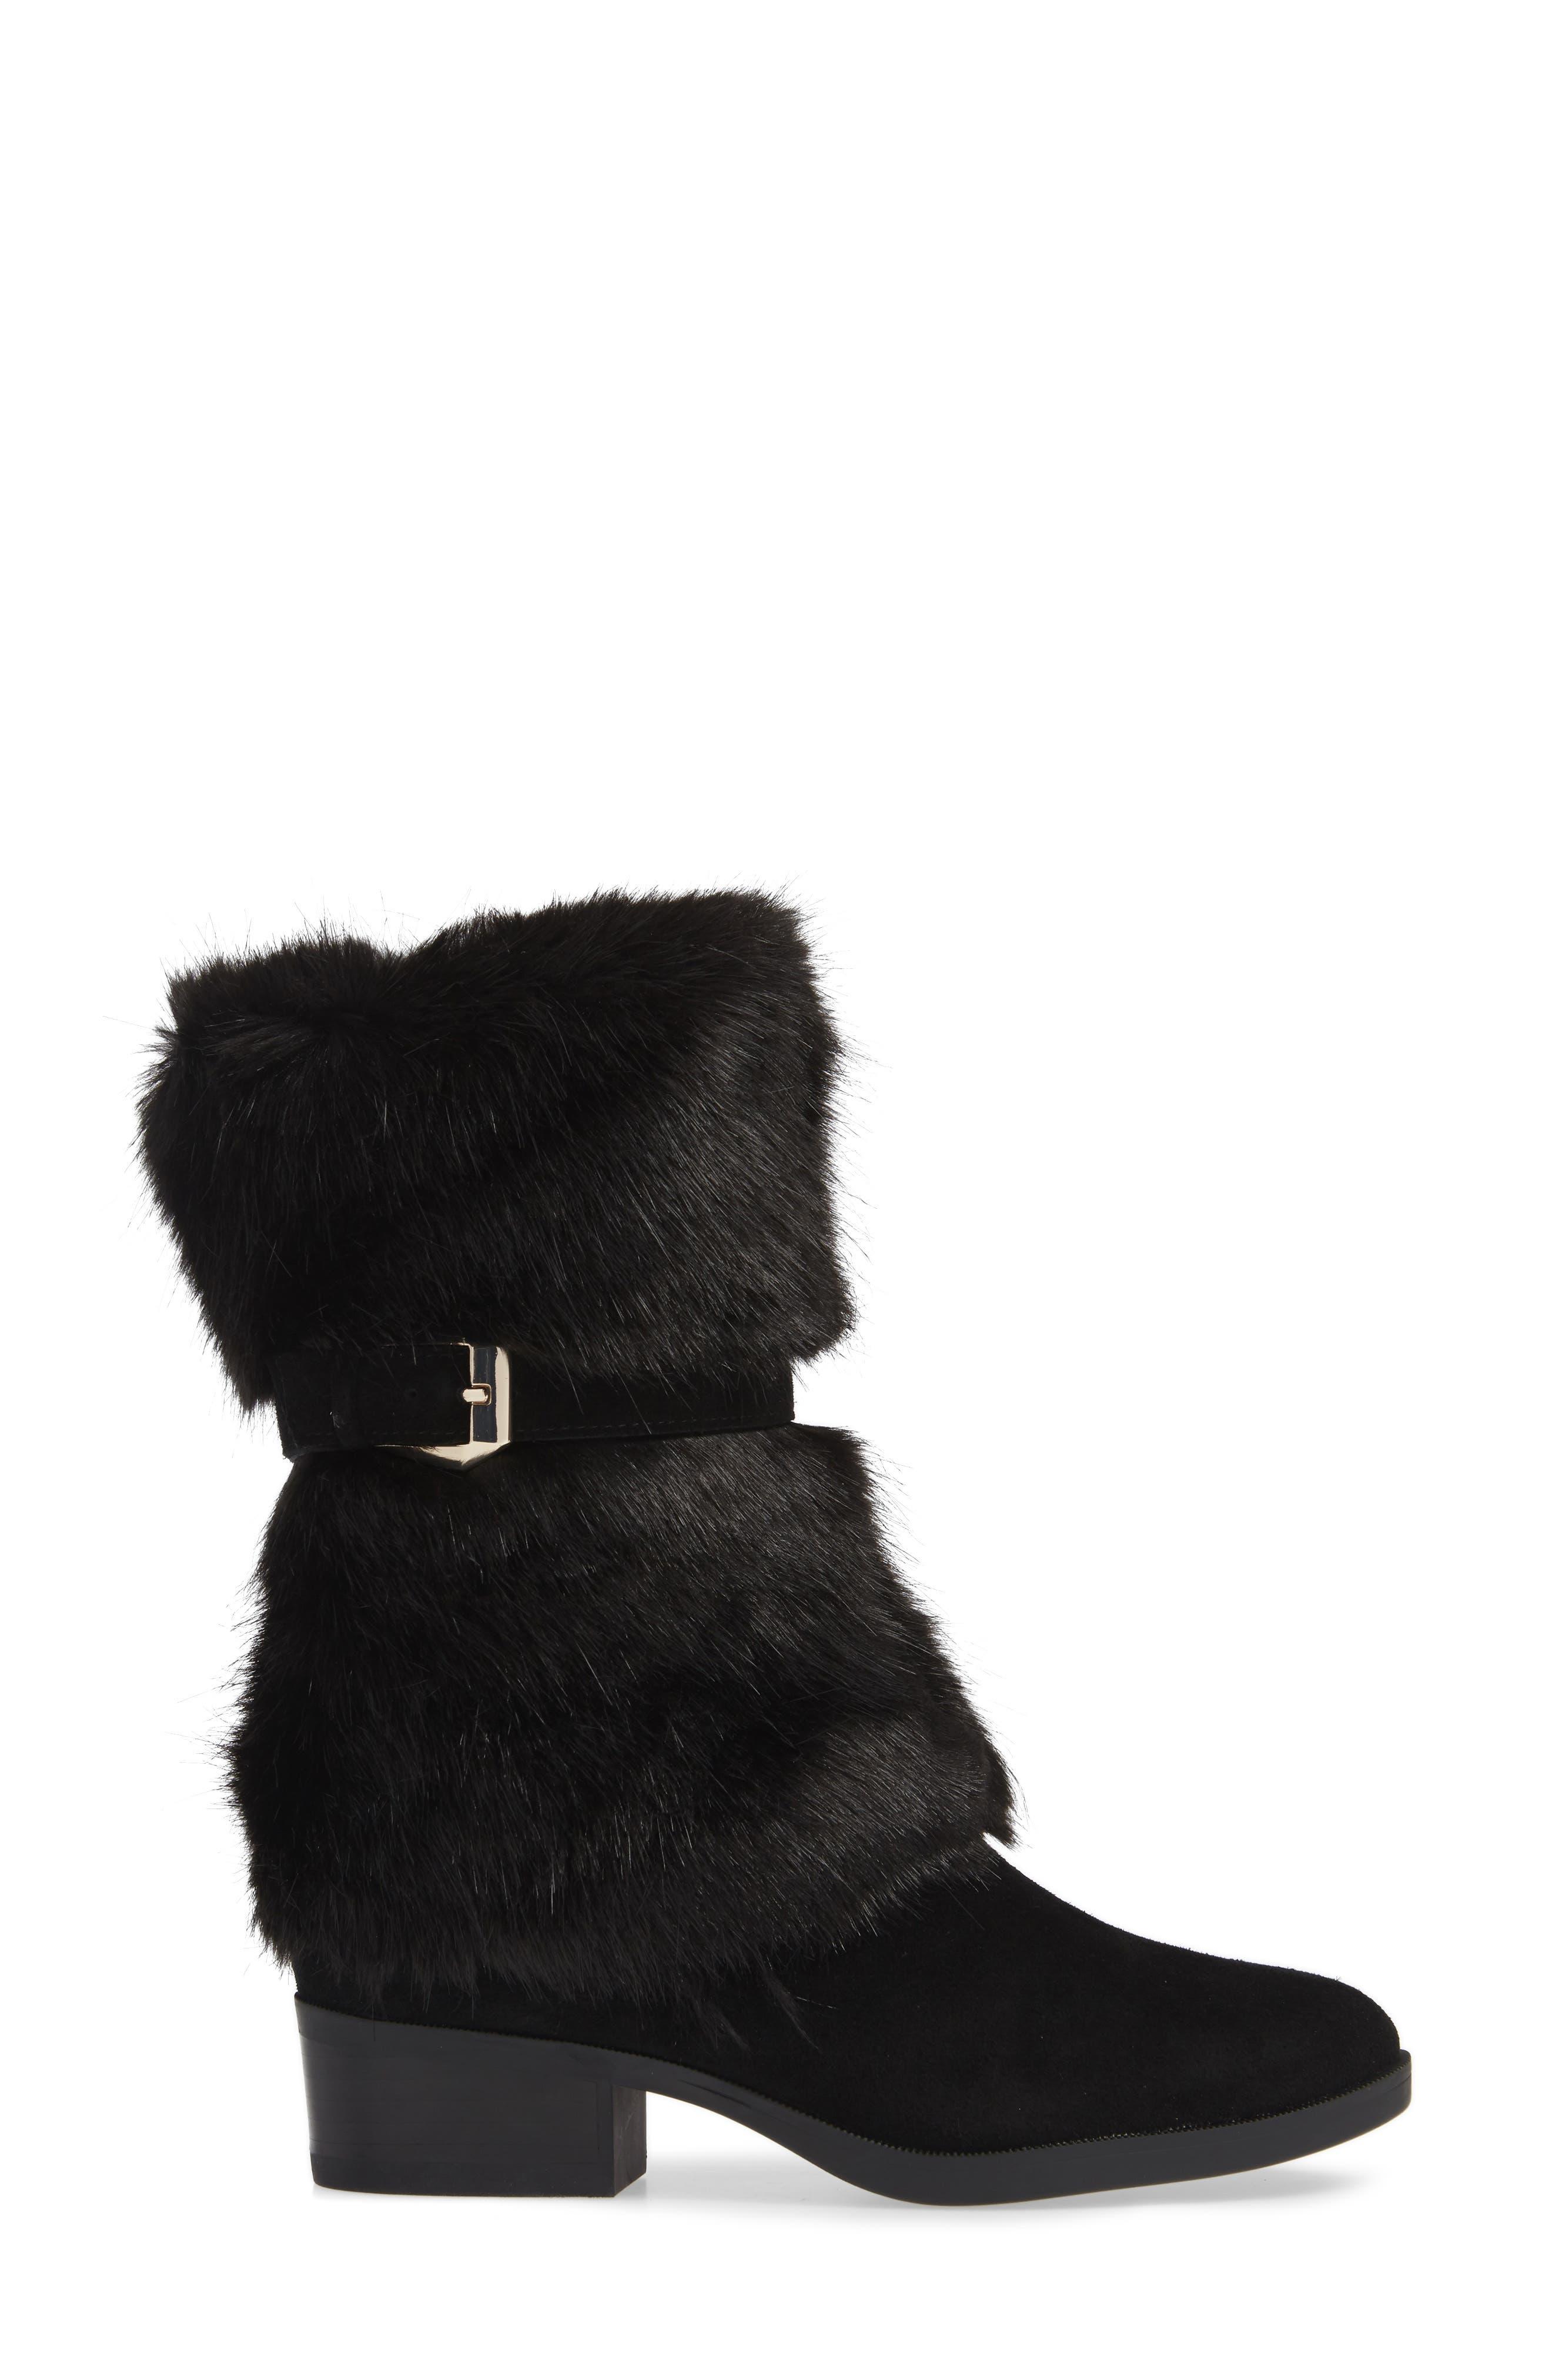 Giselle Water Resistant Faux Fur Boot,                             Alternate thumbnail 3, color,                             BLACK SUEDE